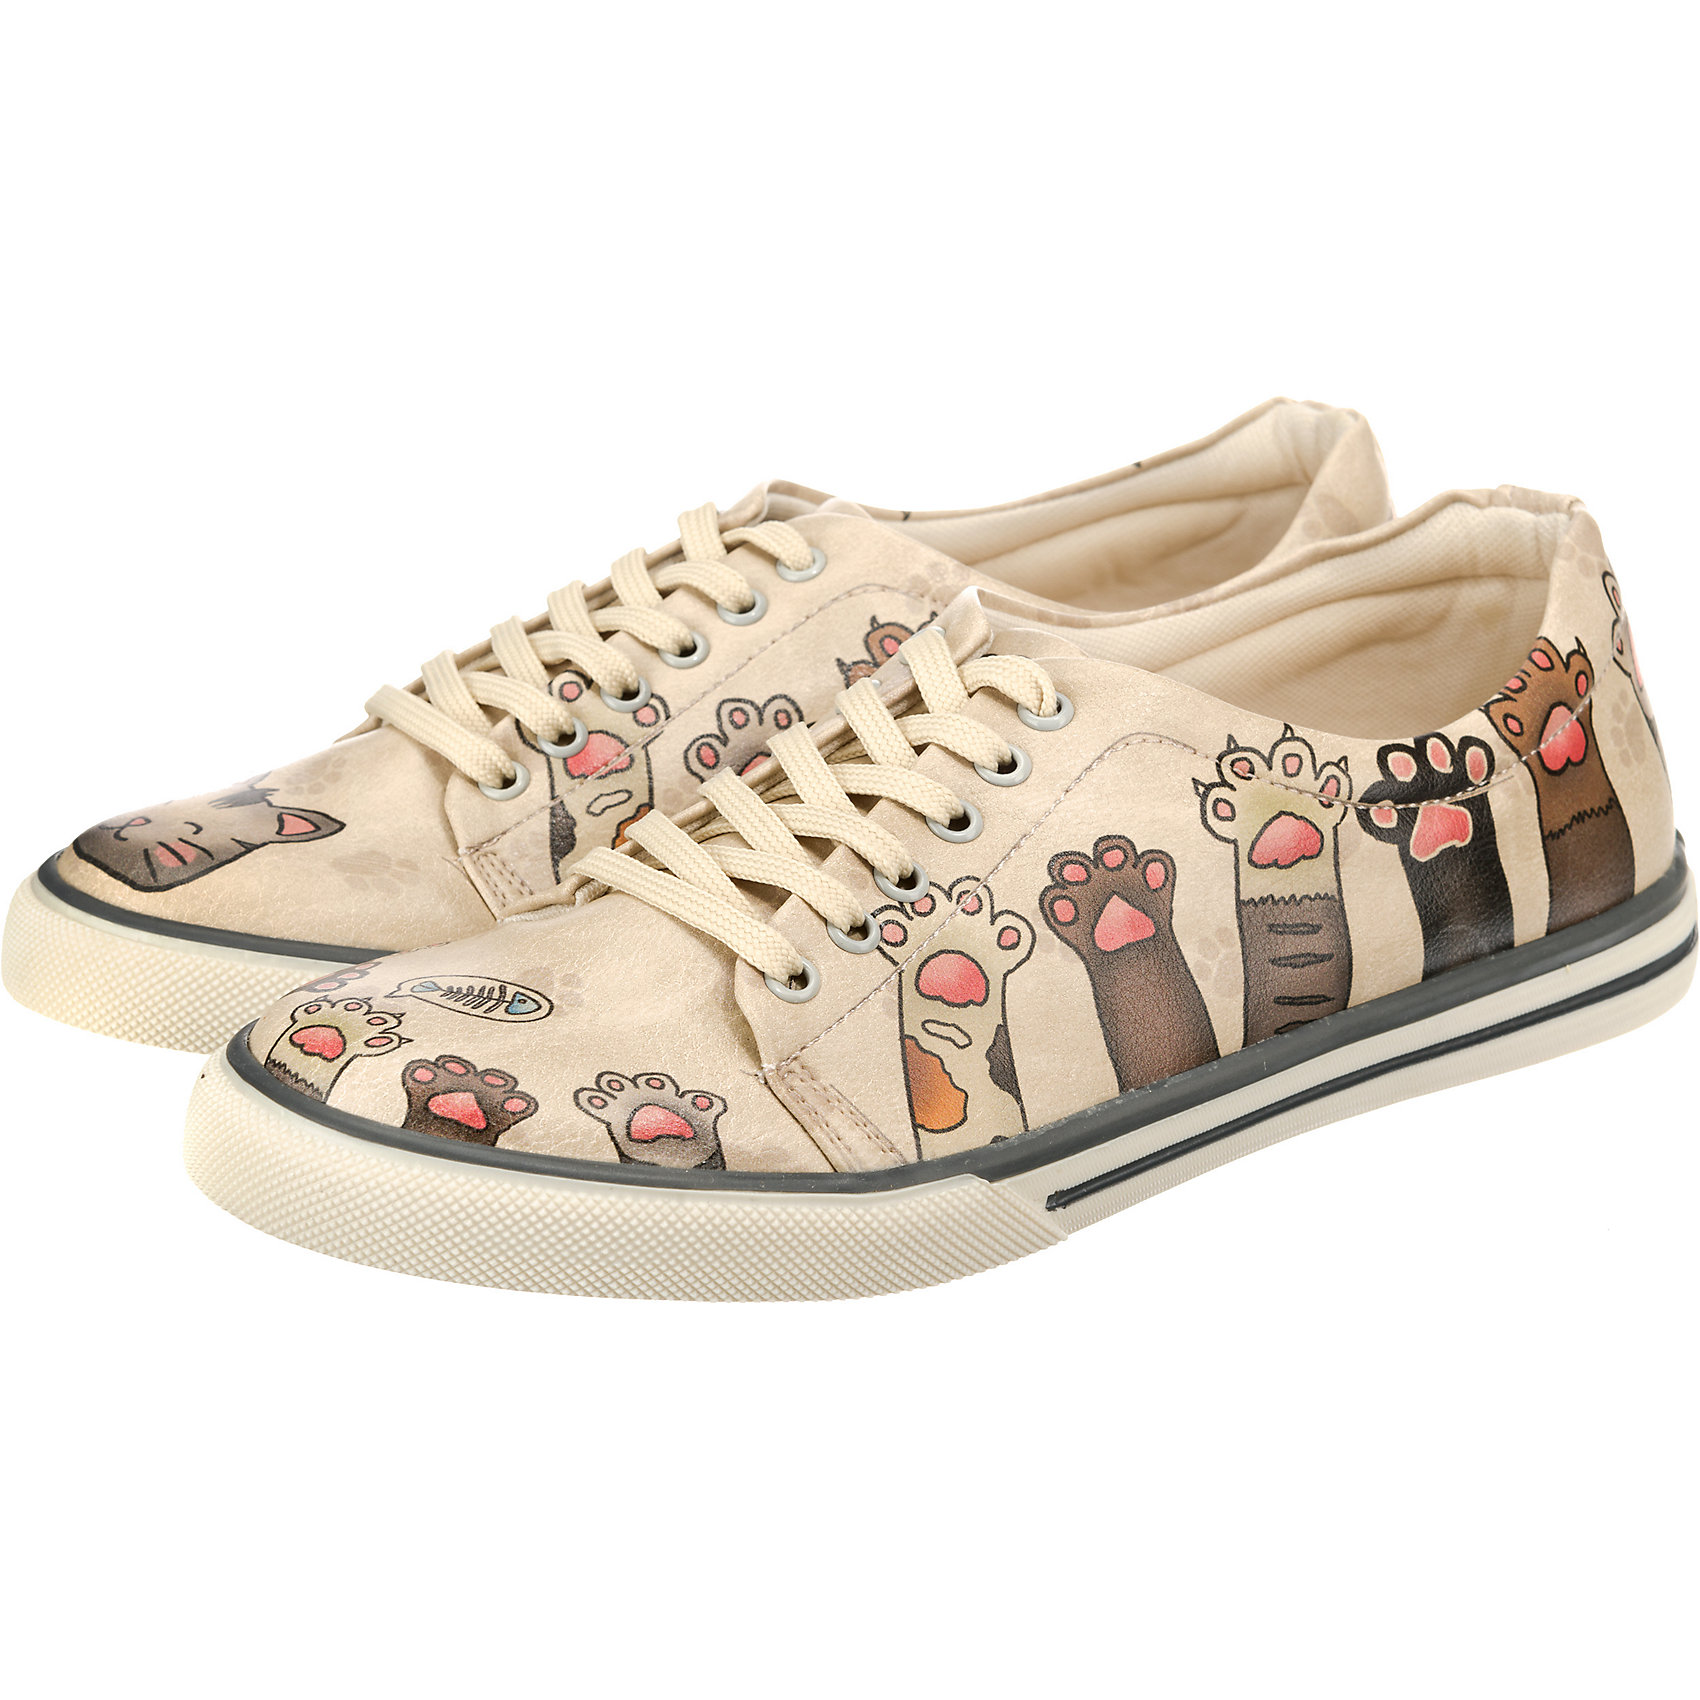 3430a60114 Neu Dogo Shoes Yummy Sneakers Low 7338985 für Damen mehrfarbig | eBay